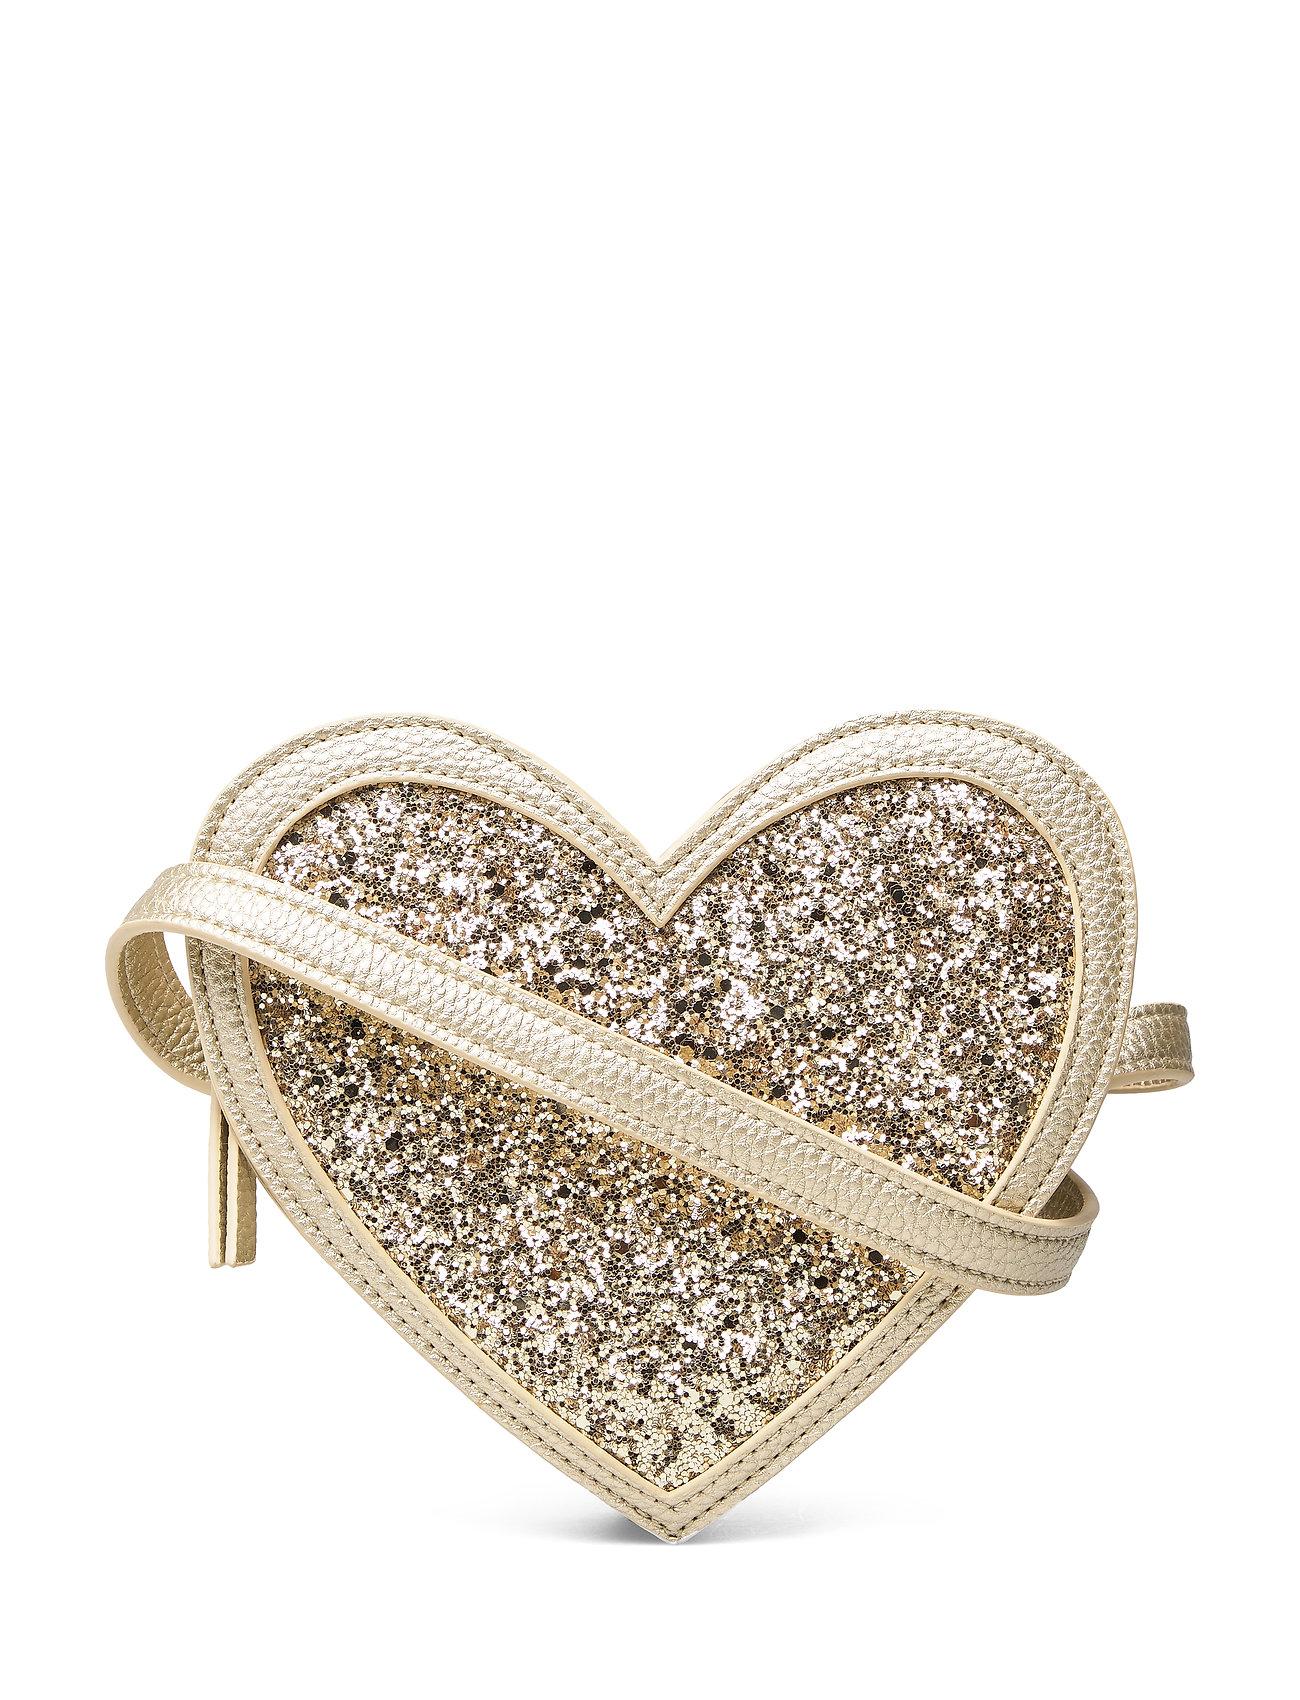 Molo Heart Bag - GOLD GLITTER